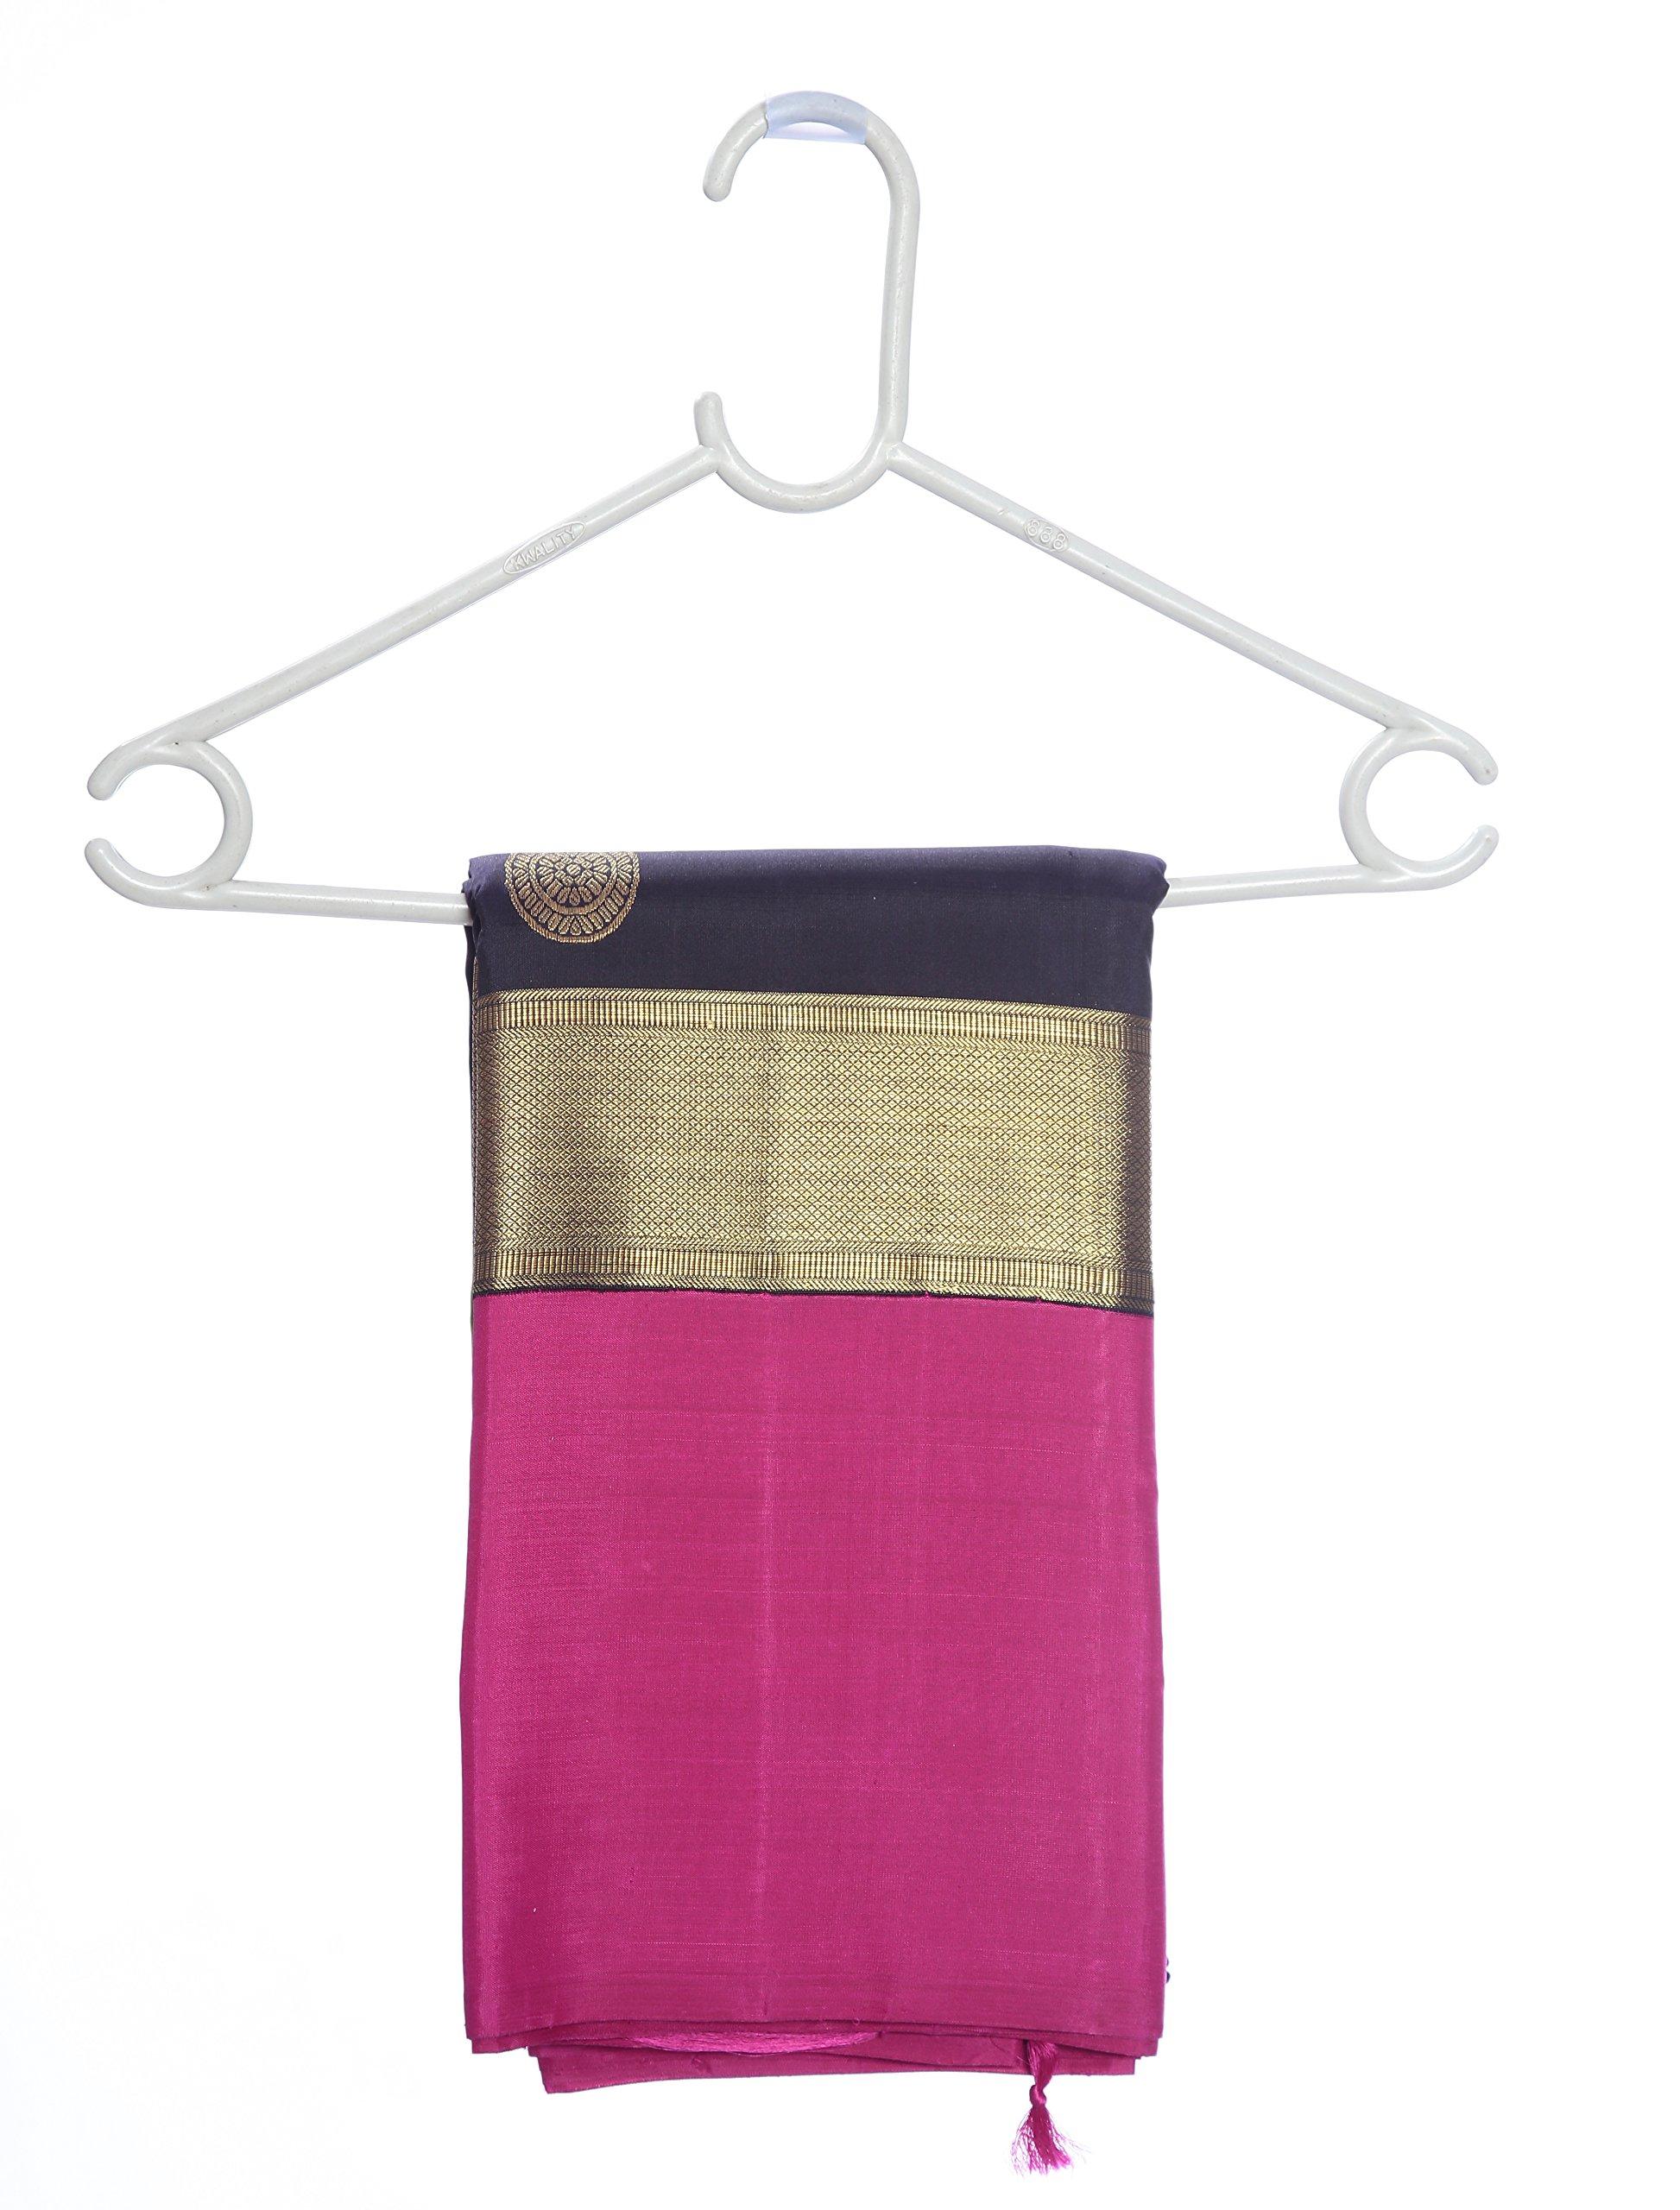 Mandakini — Indian Women's Kanchipuram - Handloom - Pure Zari & Pure Silk Saree (Black ) (MK214) by Mandakini (Image #6)